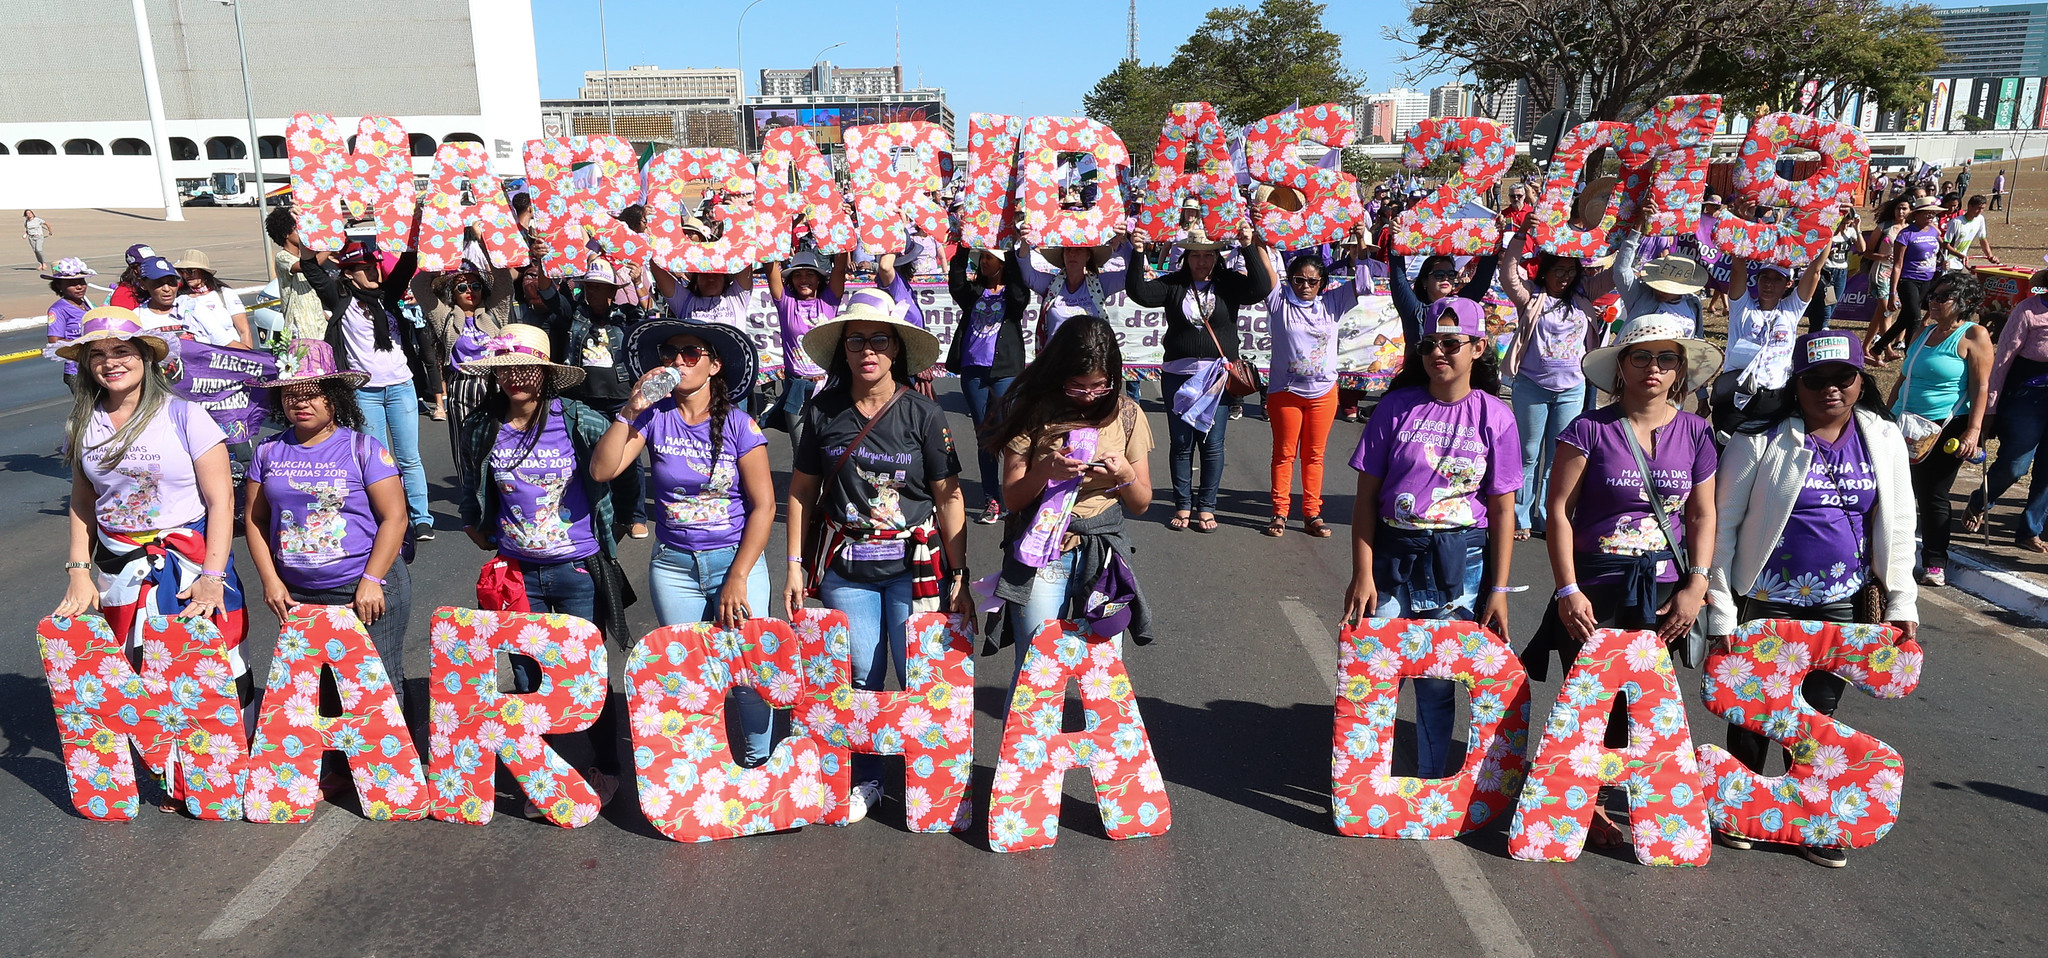 Pernambucanas rumo a Brasília na 6ª Marcha das Margaridas